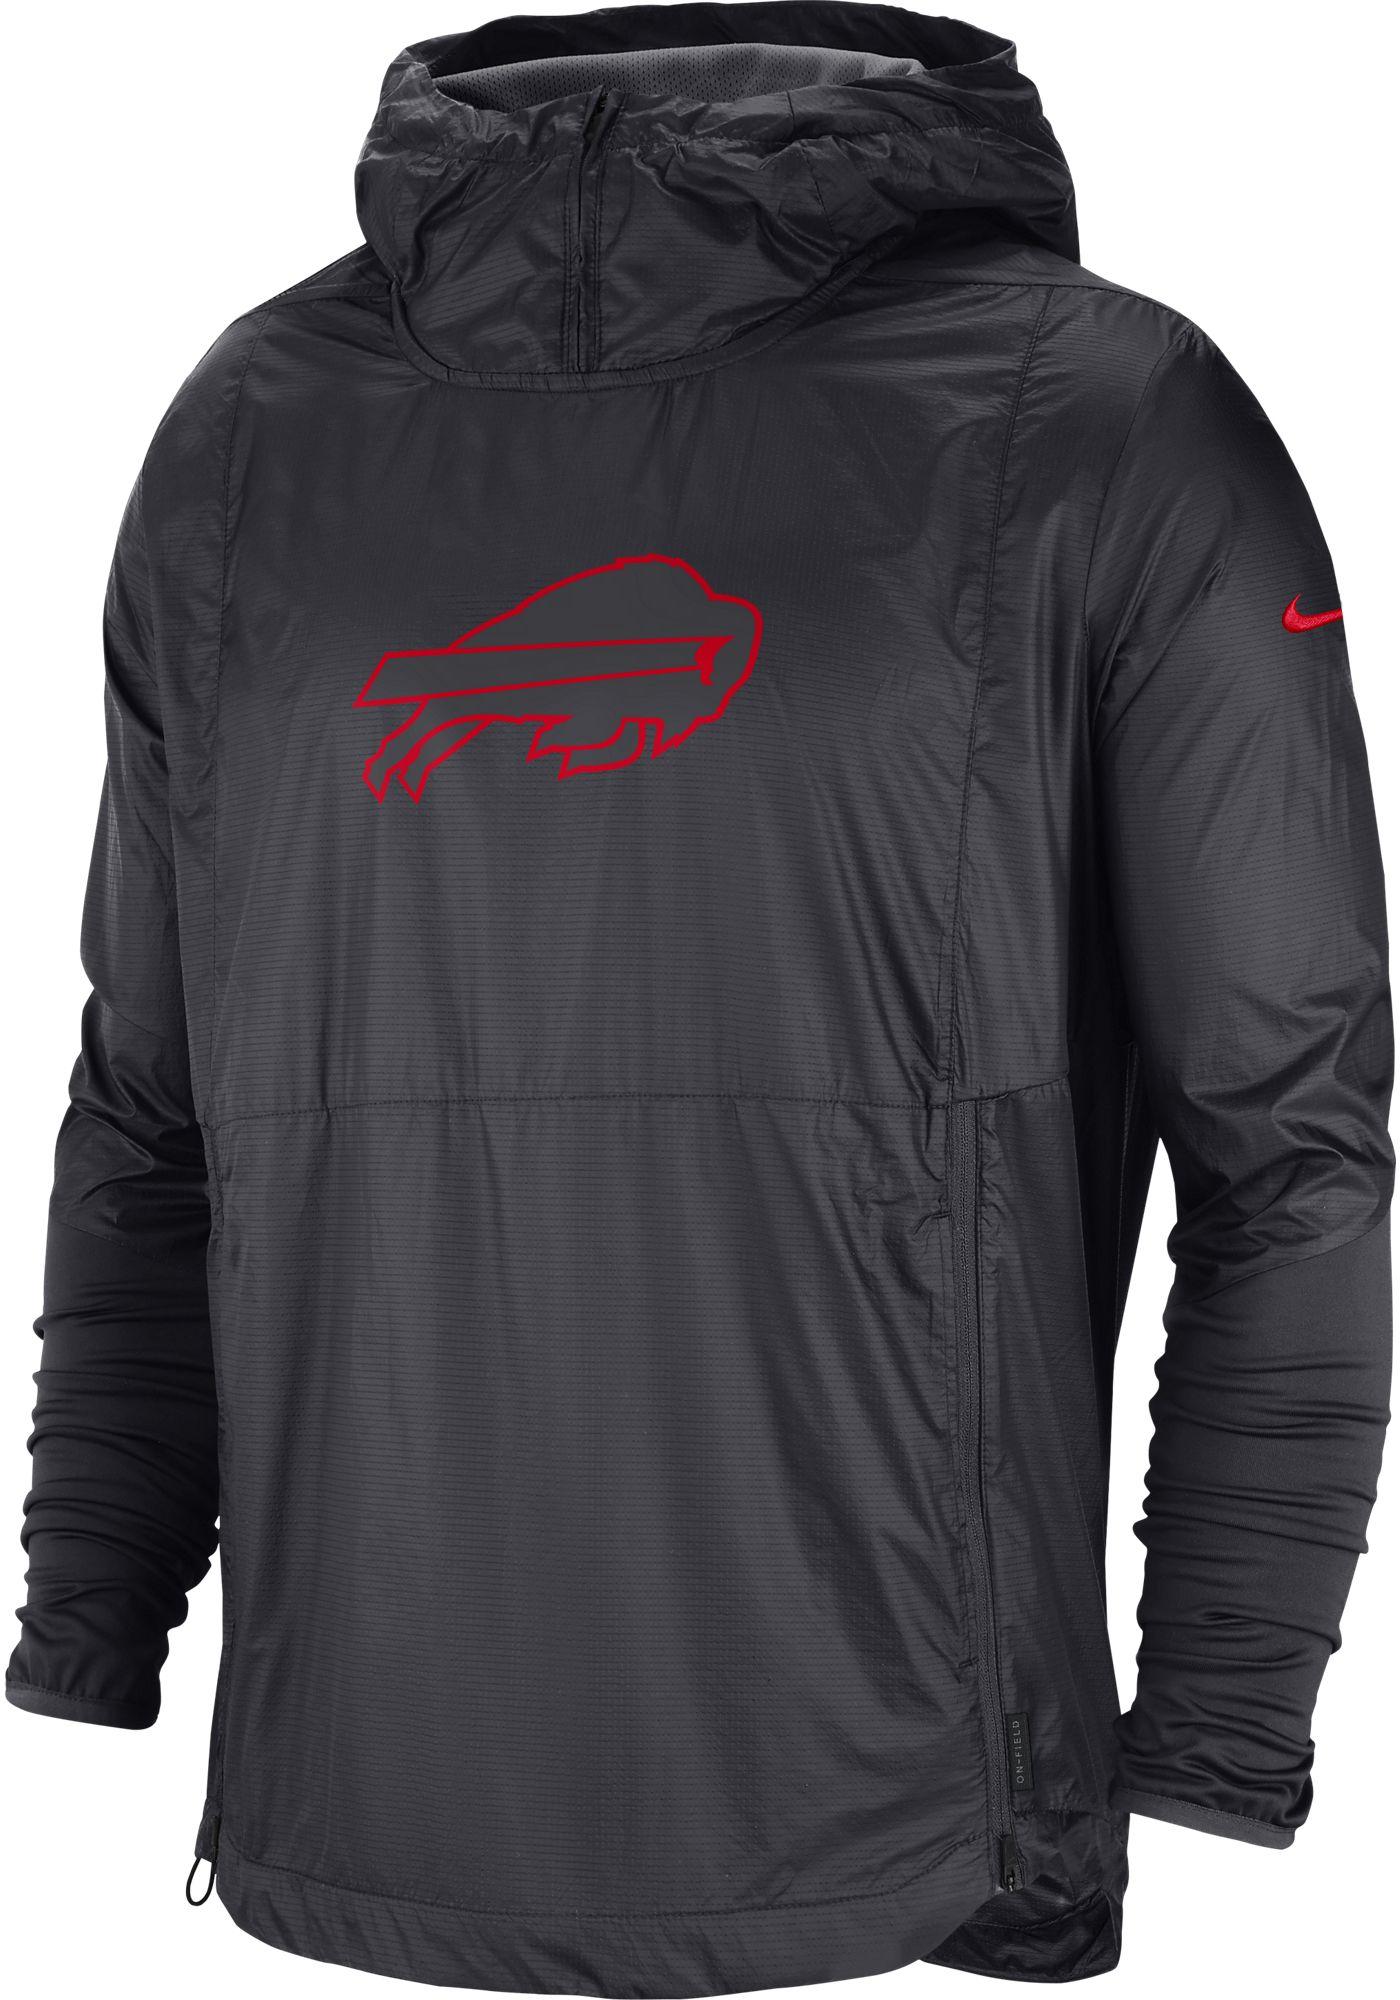 Nike Men's Buffalo Bills Sideline Repel Player Anthracite Jacket